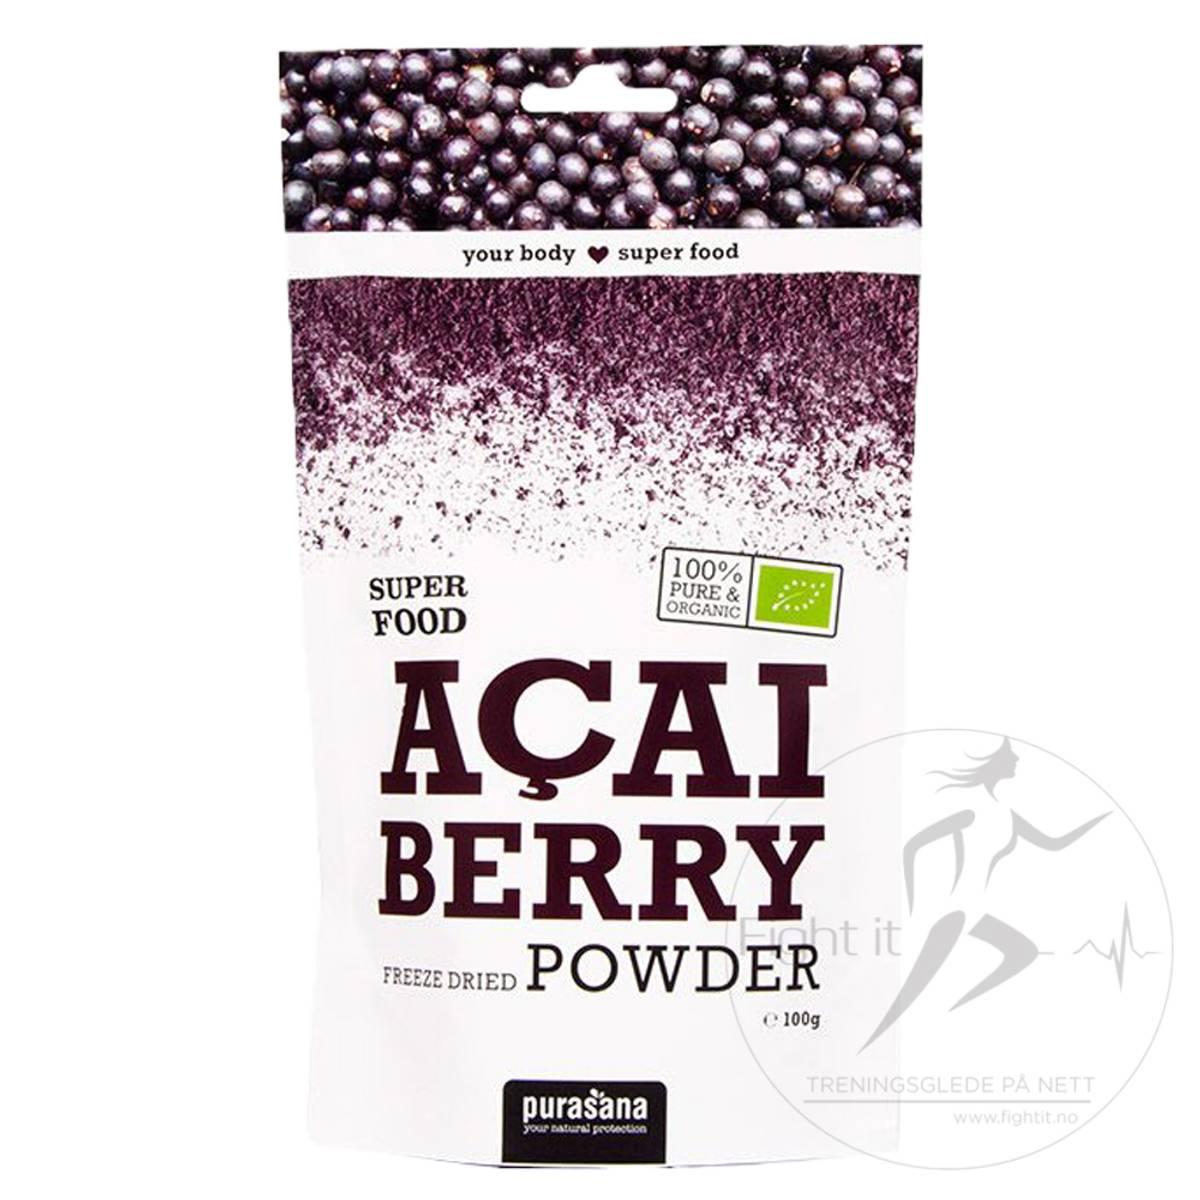 Purasana - Acai Berry Powder 100g